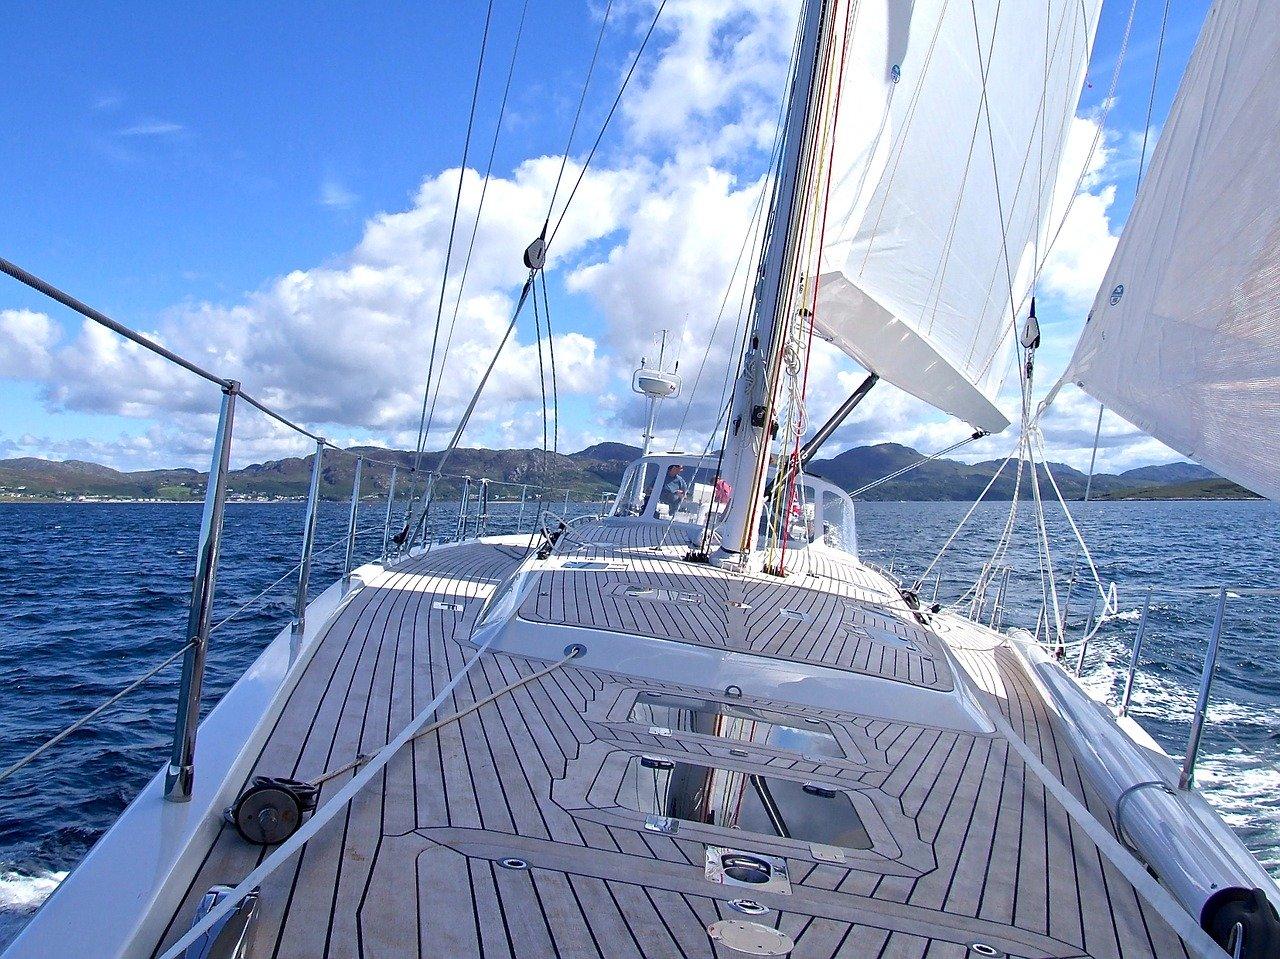 yacht, sea, boat